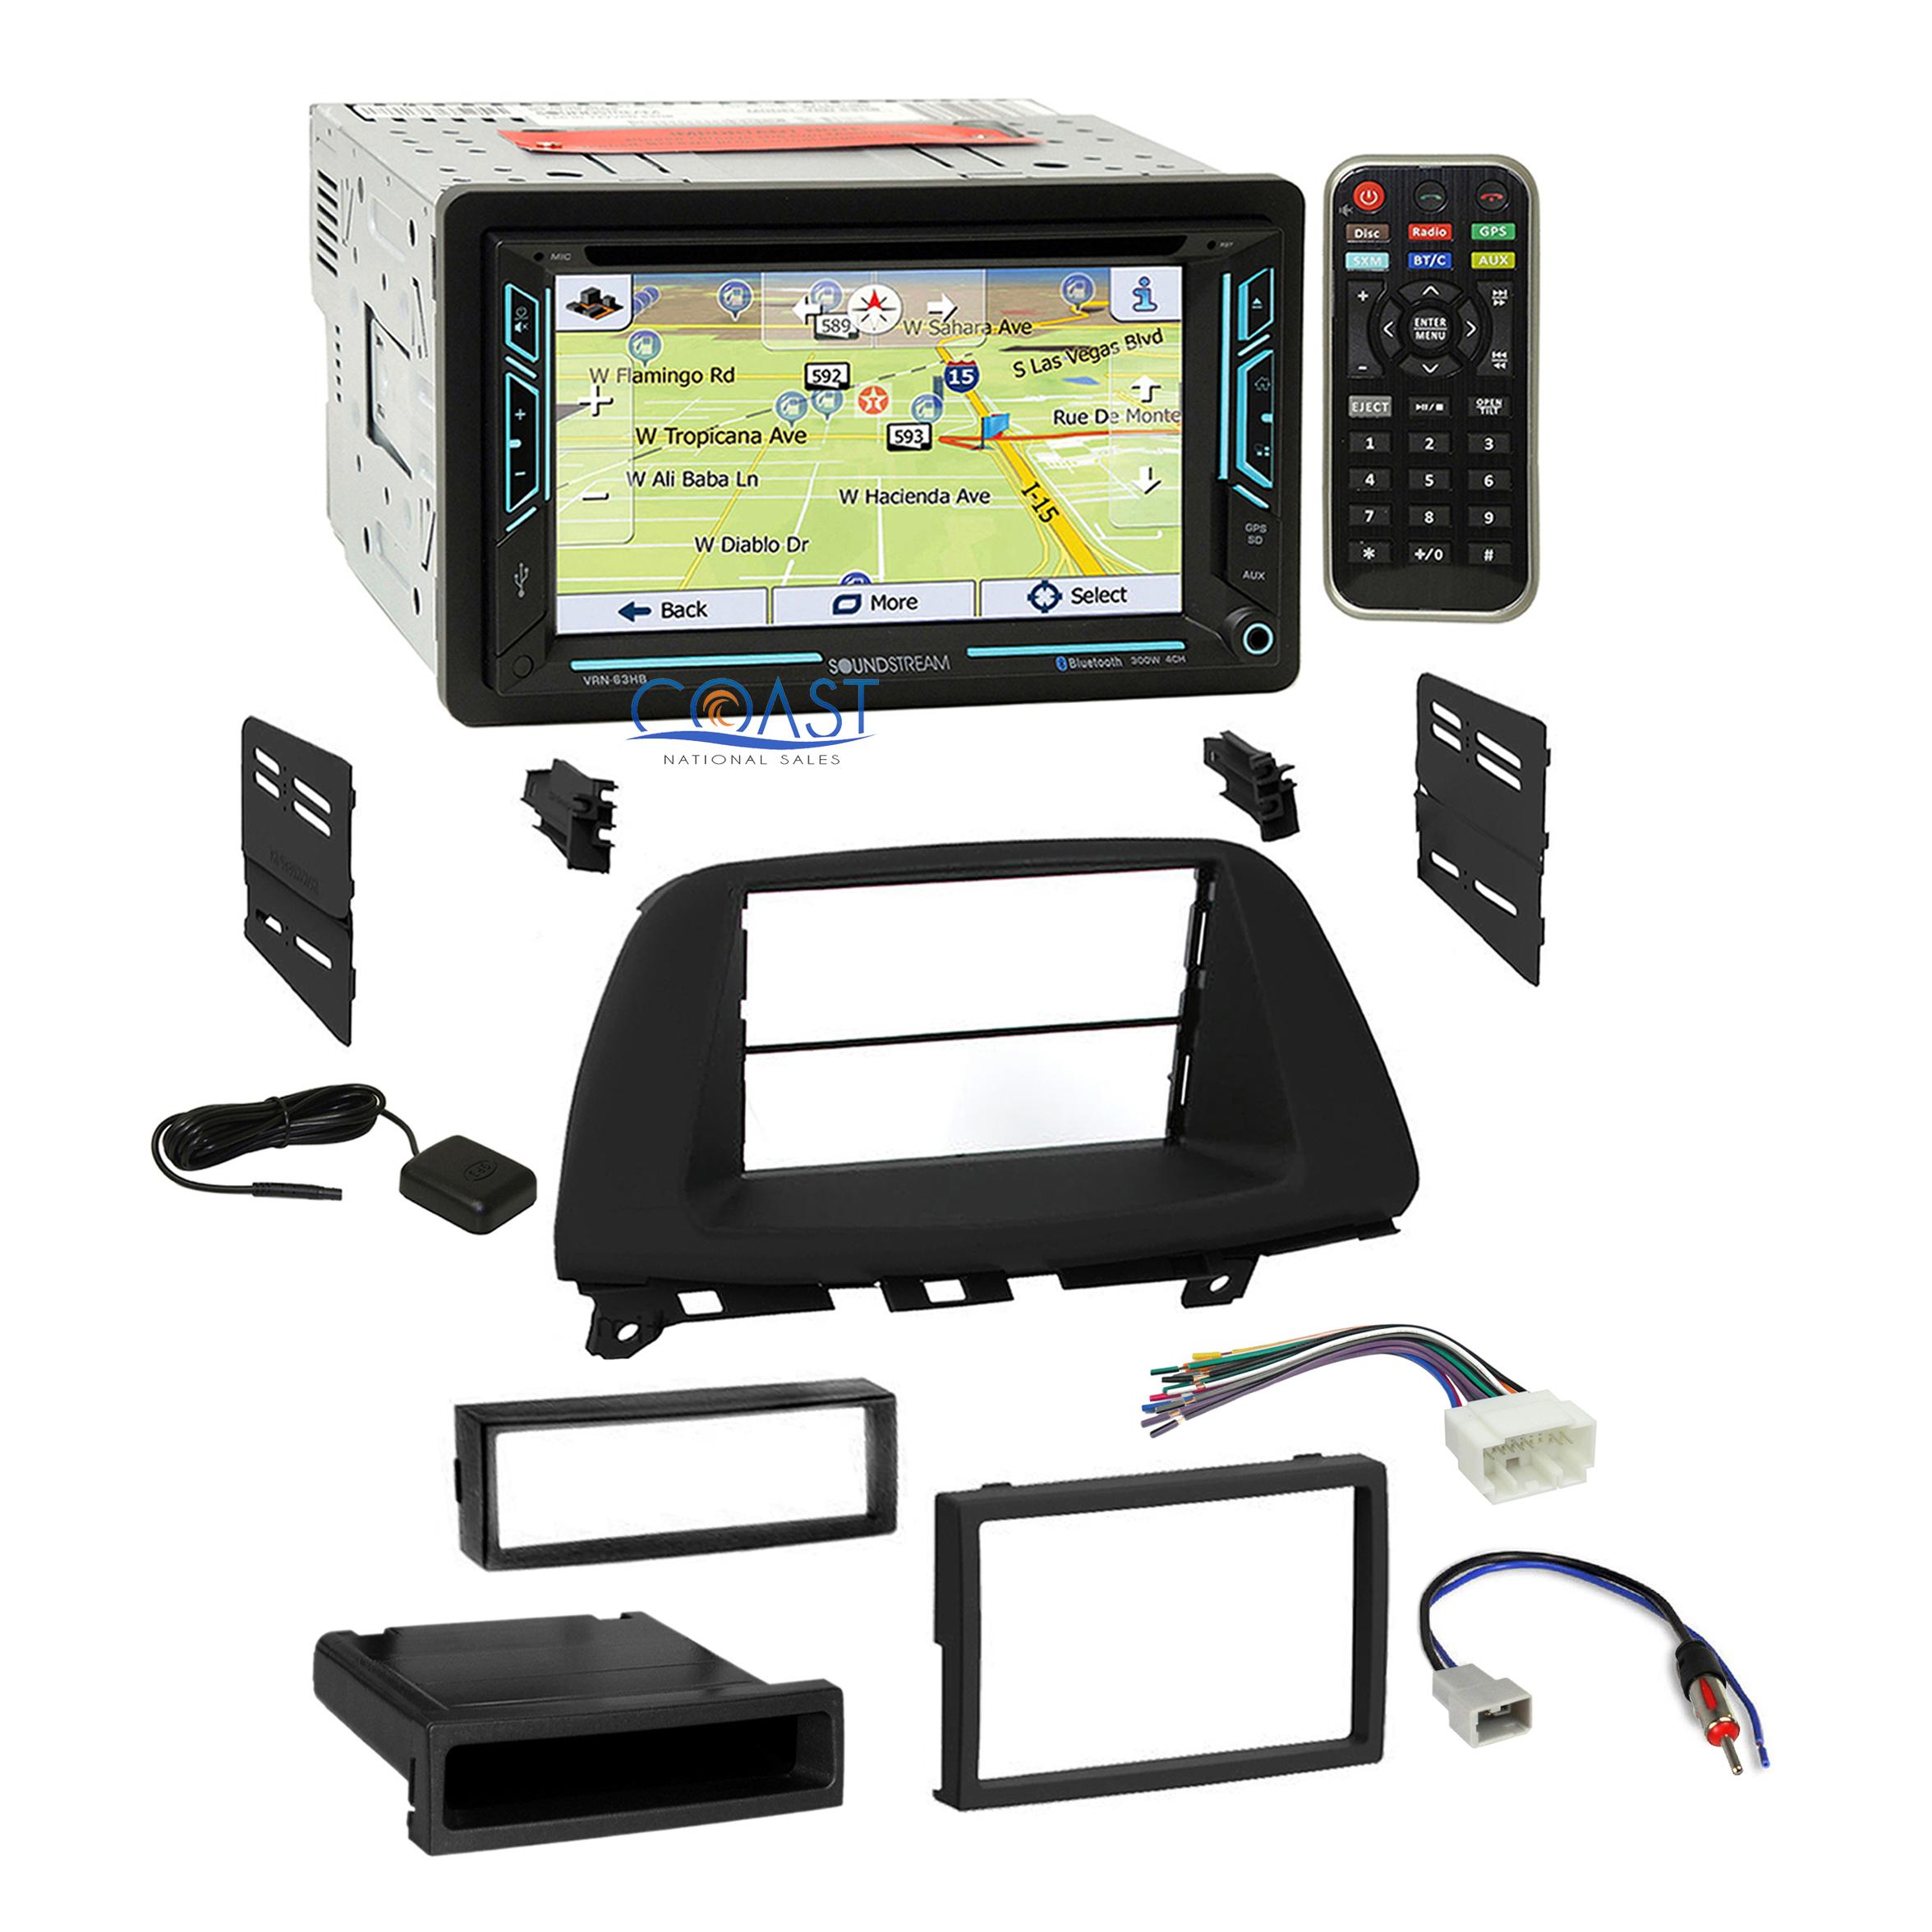 American International Aftermarket ABS Car Stereo Installation Dash Kit HON-K835